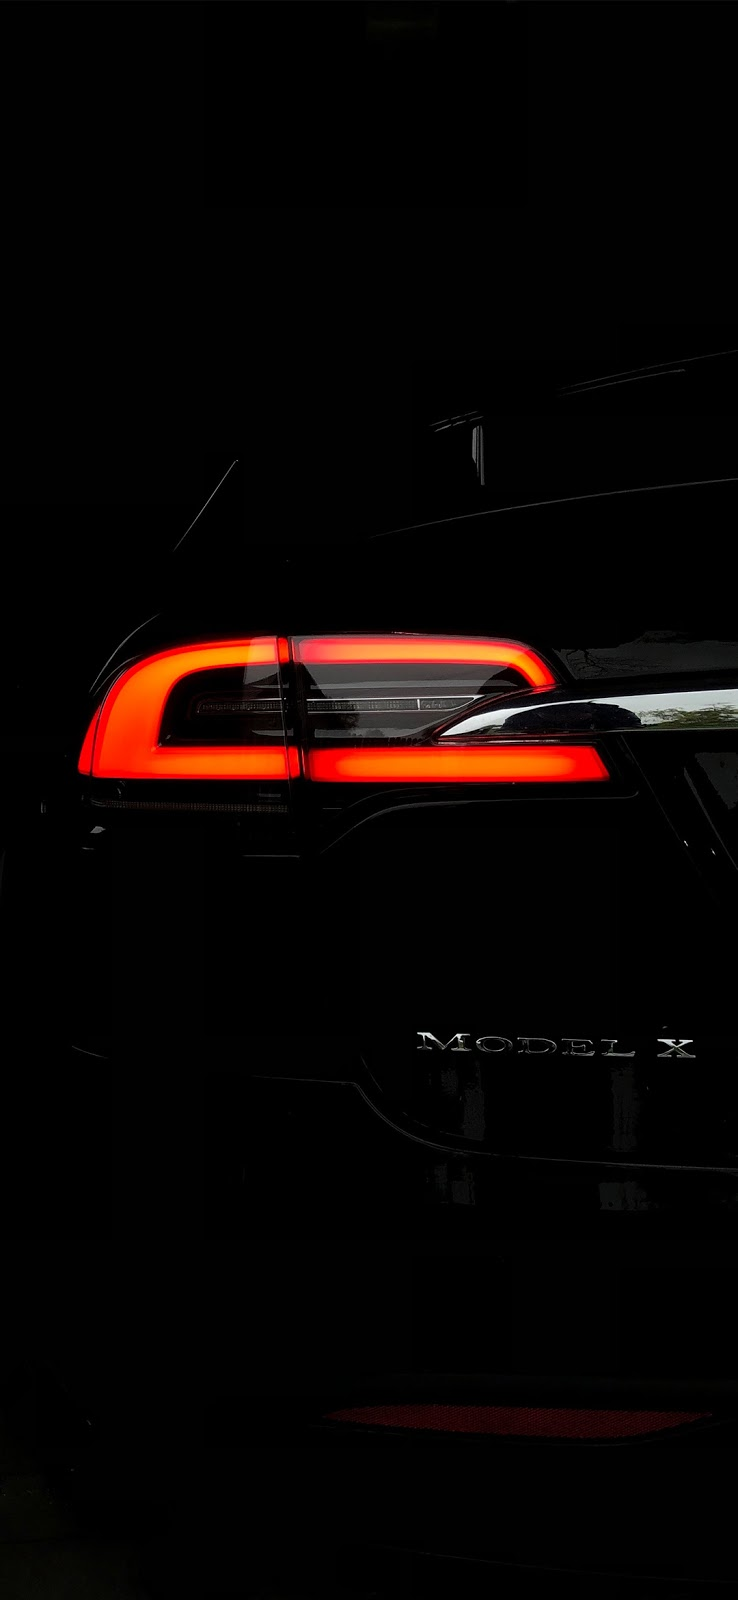 tail light of tesla model X vehicle wallpaper